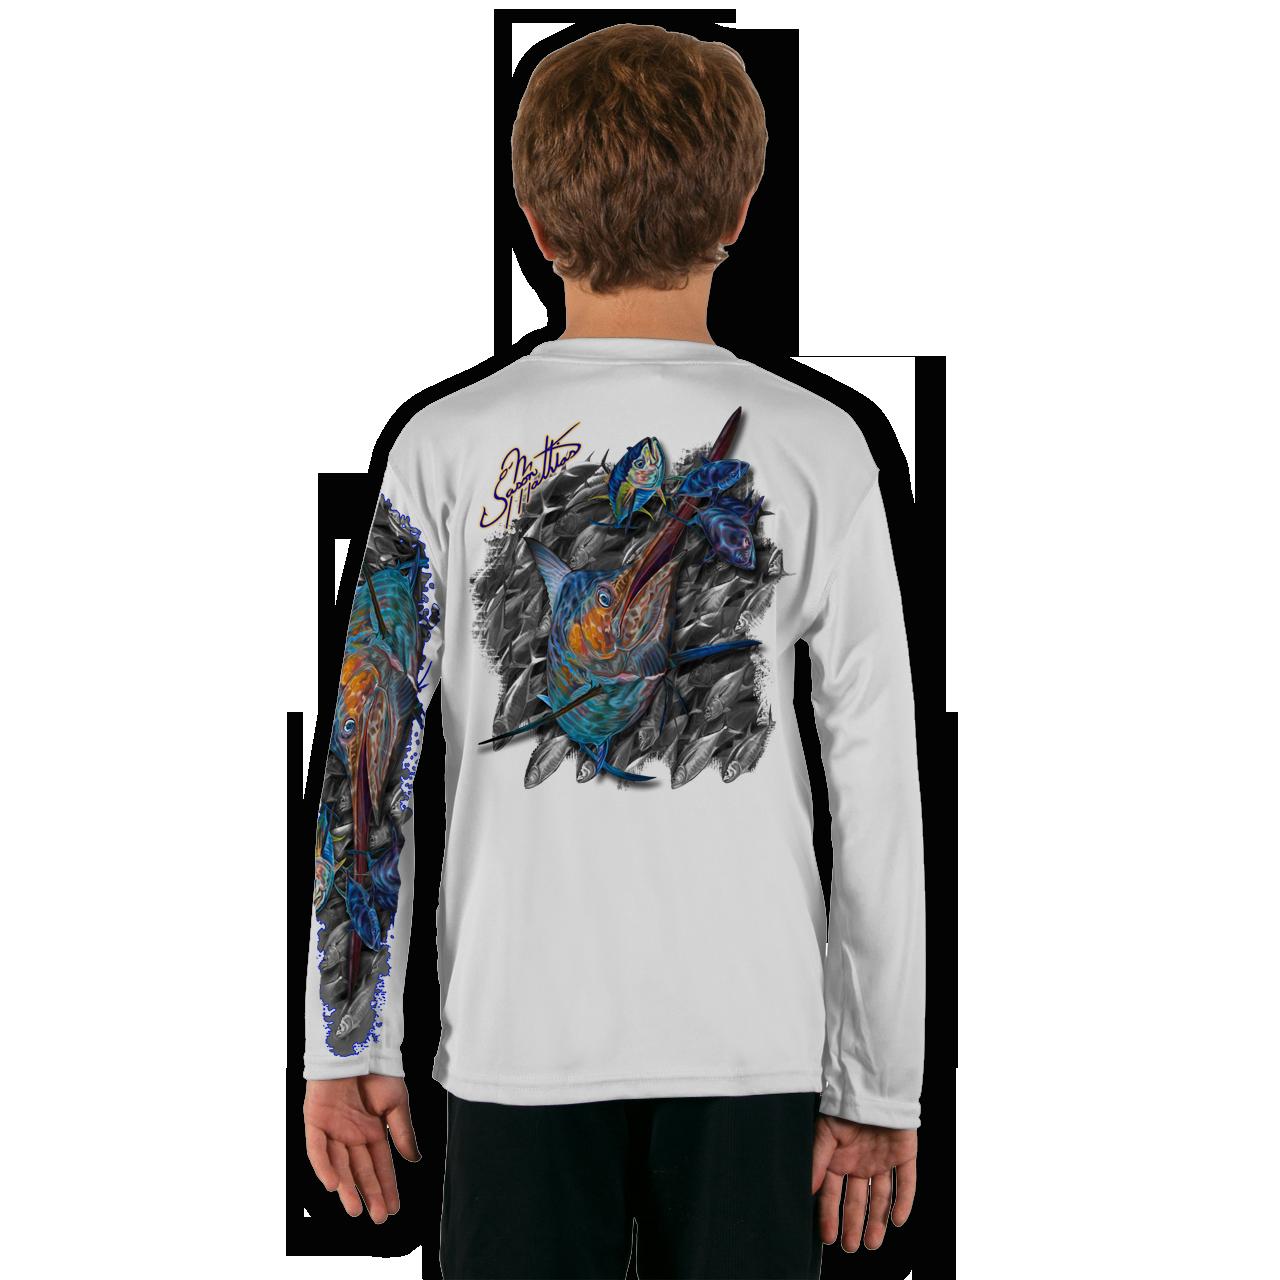 blue-marlin-tuna-white-youth-solar-ls-back-performance-shirt.png